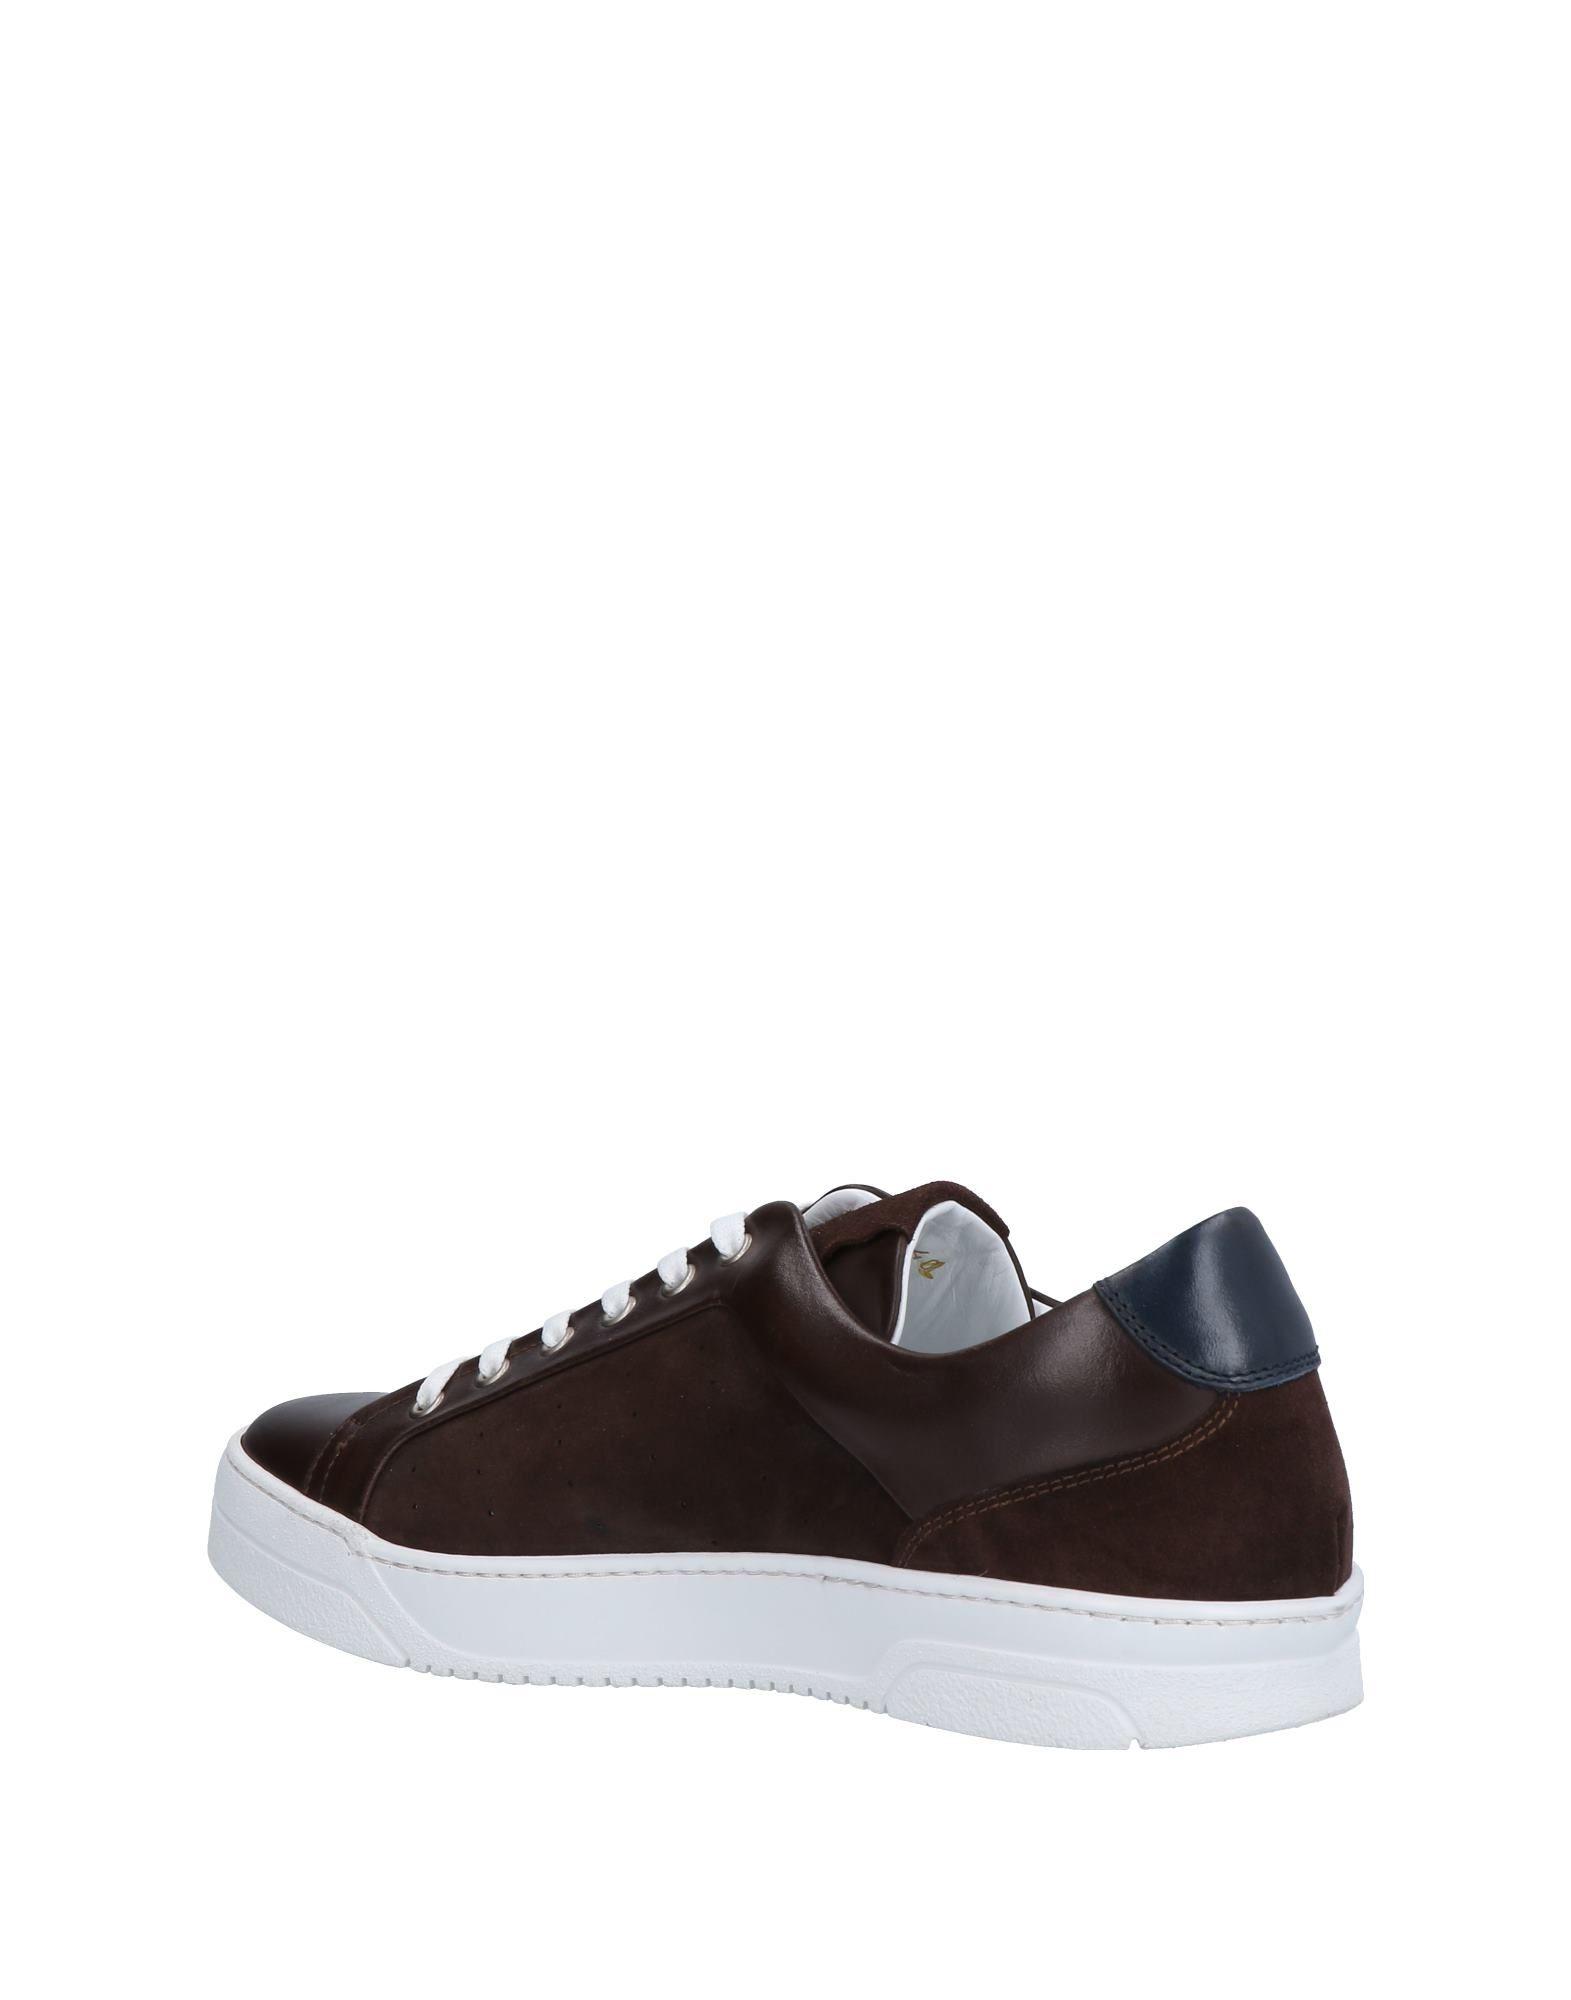 Gianfranco 11513075EL Lattanzi Sneakers Herren  11513075EL Gianfranco Neue Schuhe ef0dbf